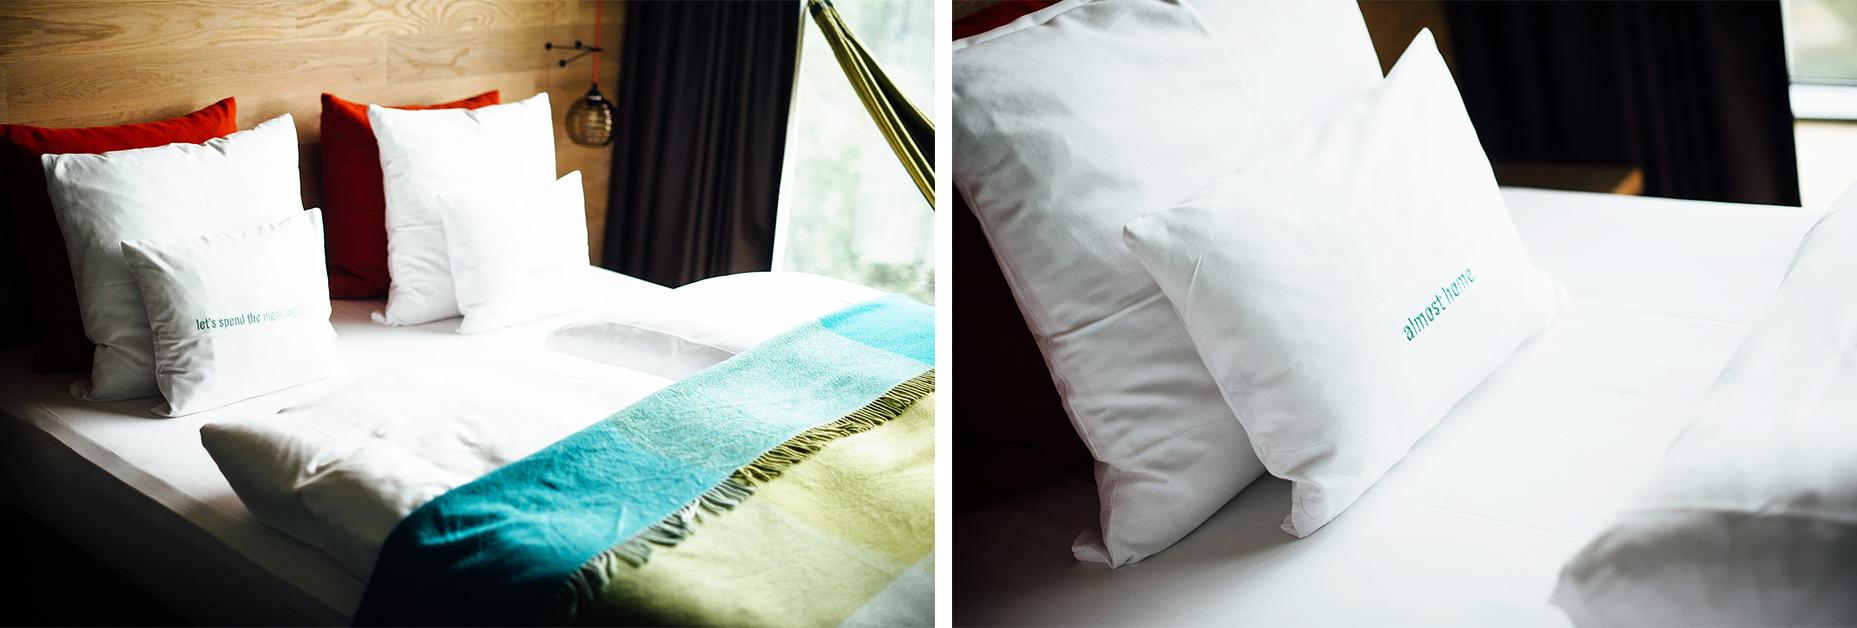 25hours-hotel-bikini-berlin_jungle-sauna_berlin-tiergarten_review_erfahrungsbericht_modeblog_reiseblog_kiamisu-8